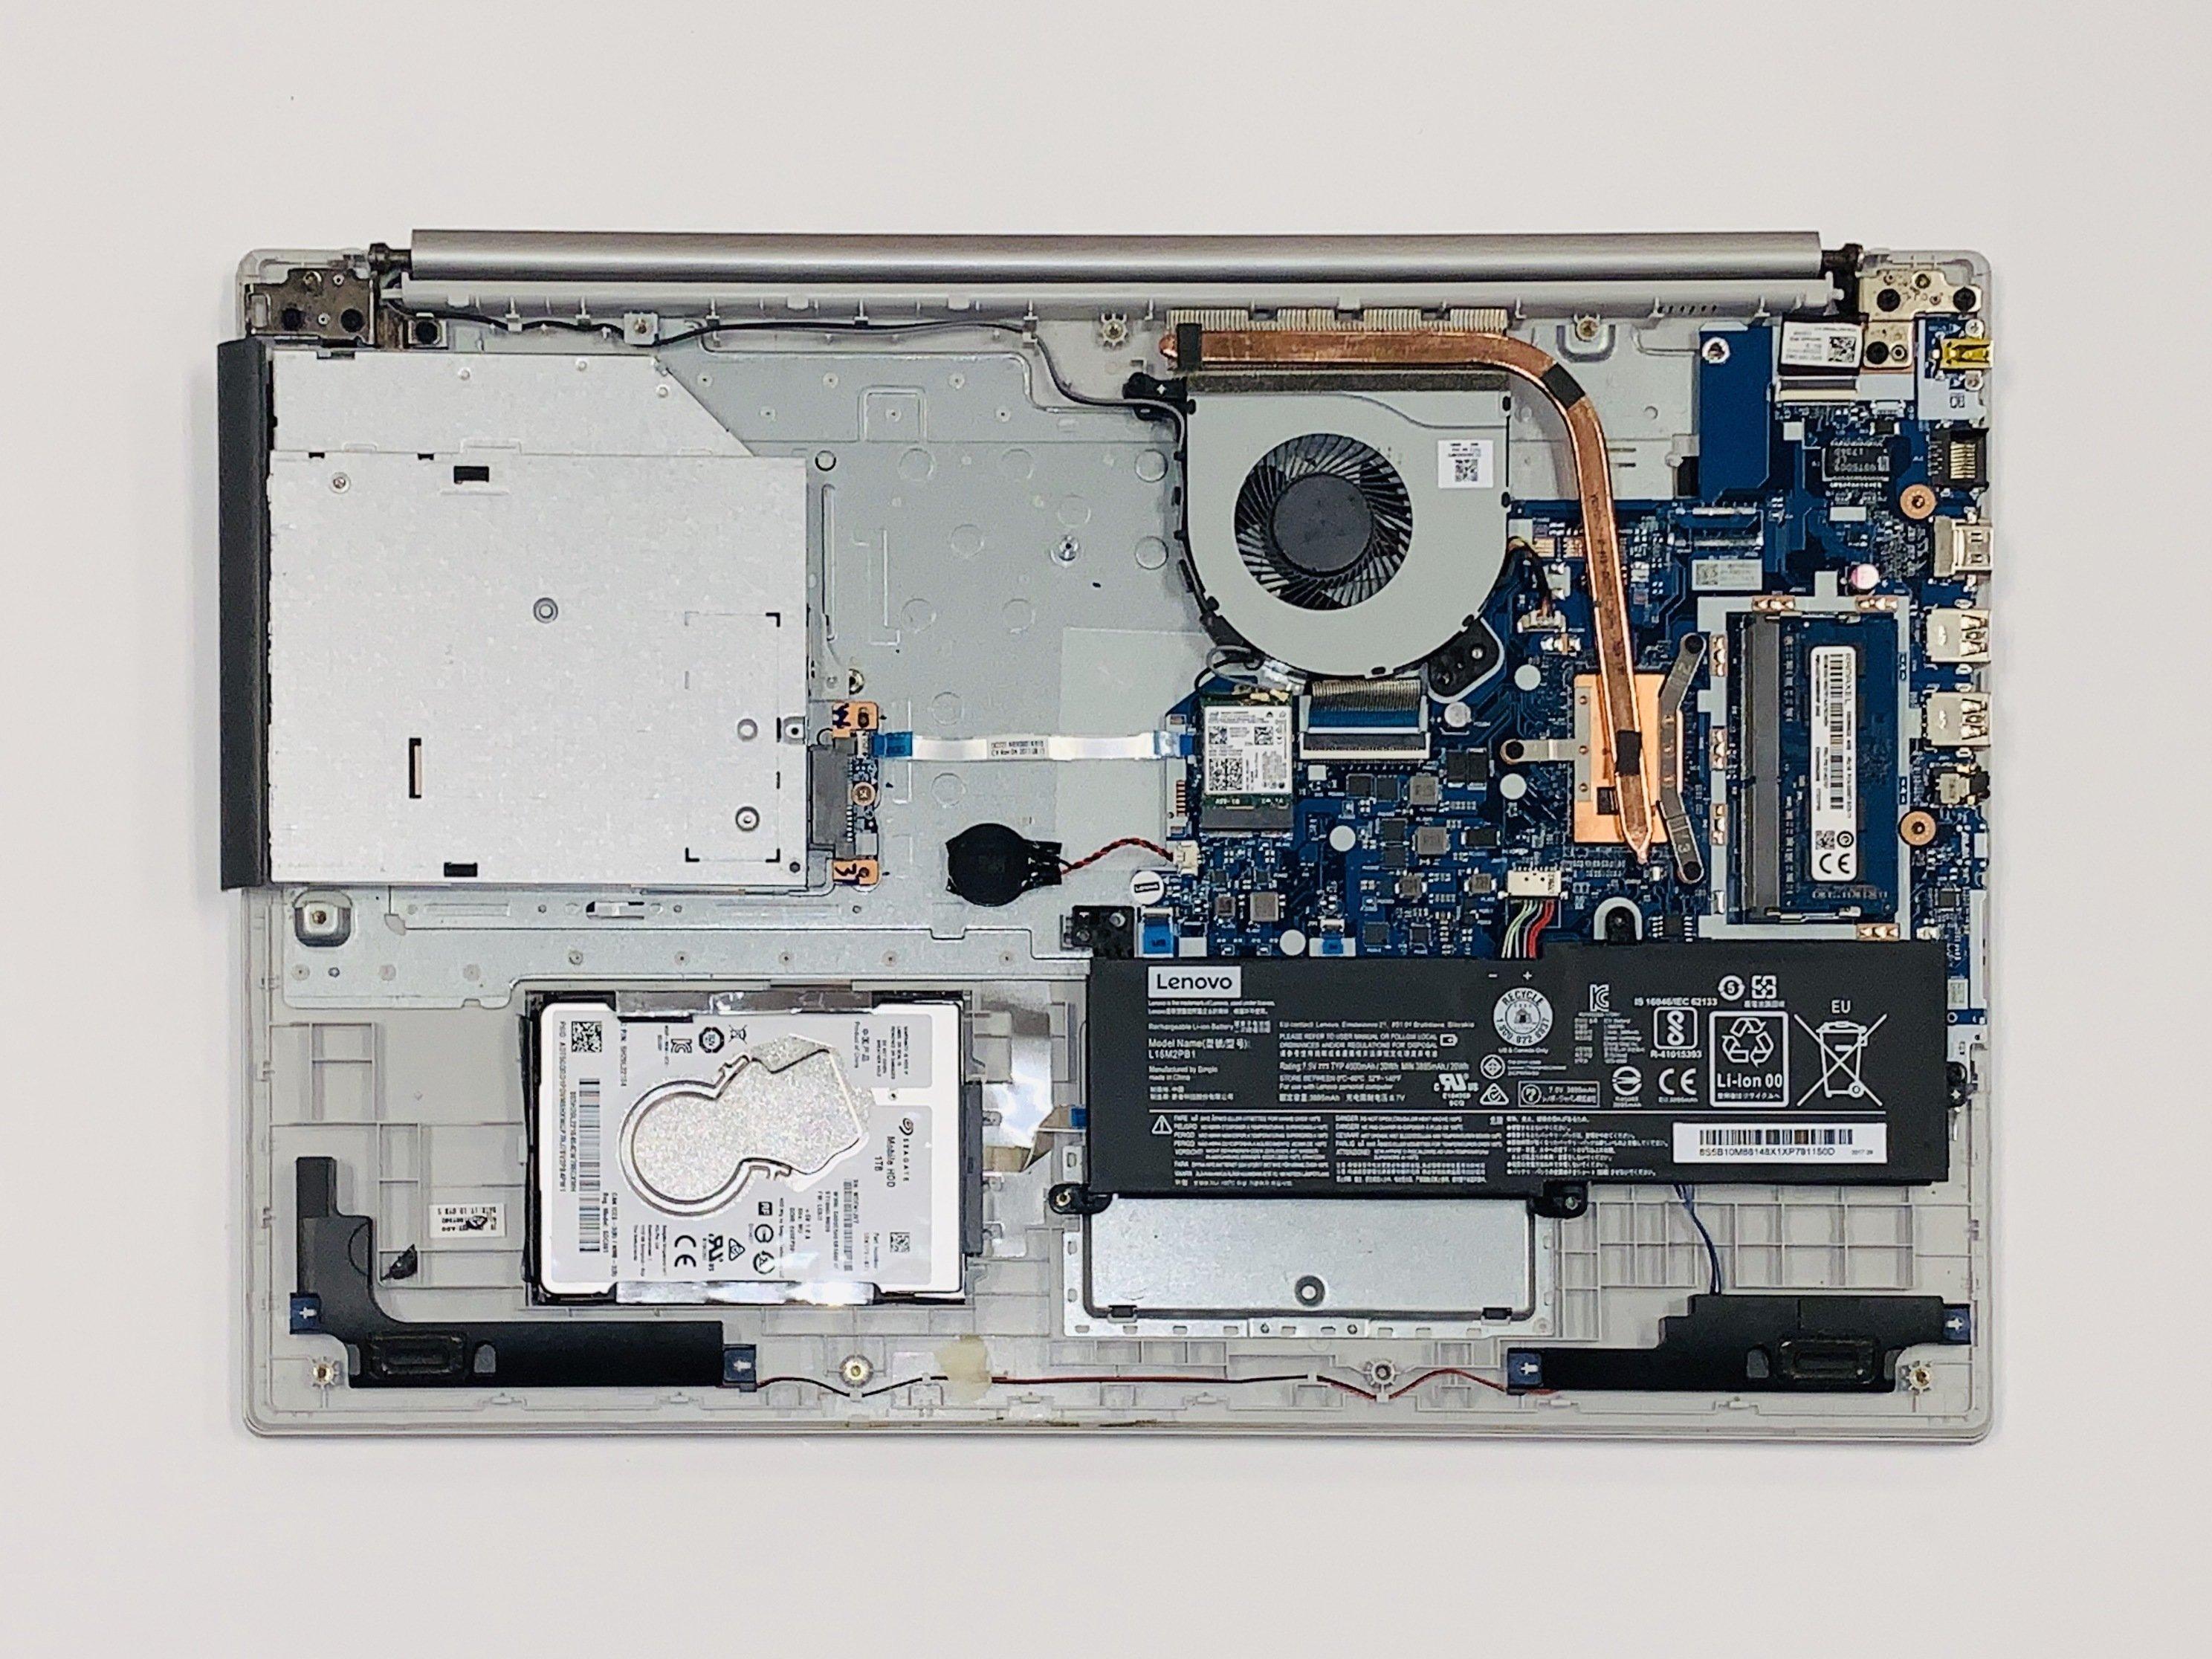 Lenovo Ideapad 320-17ikb Ports Replacement